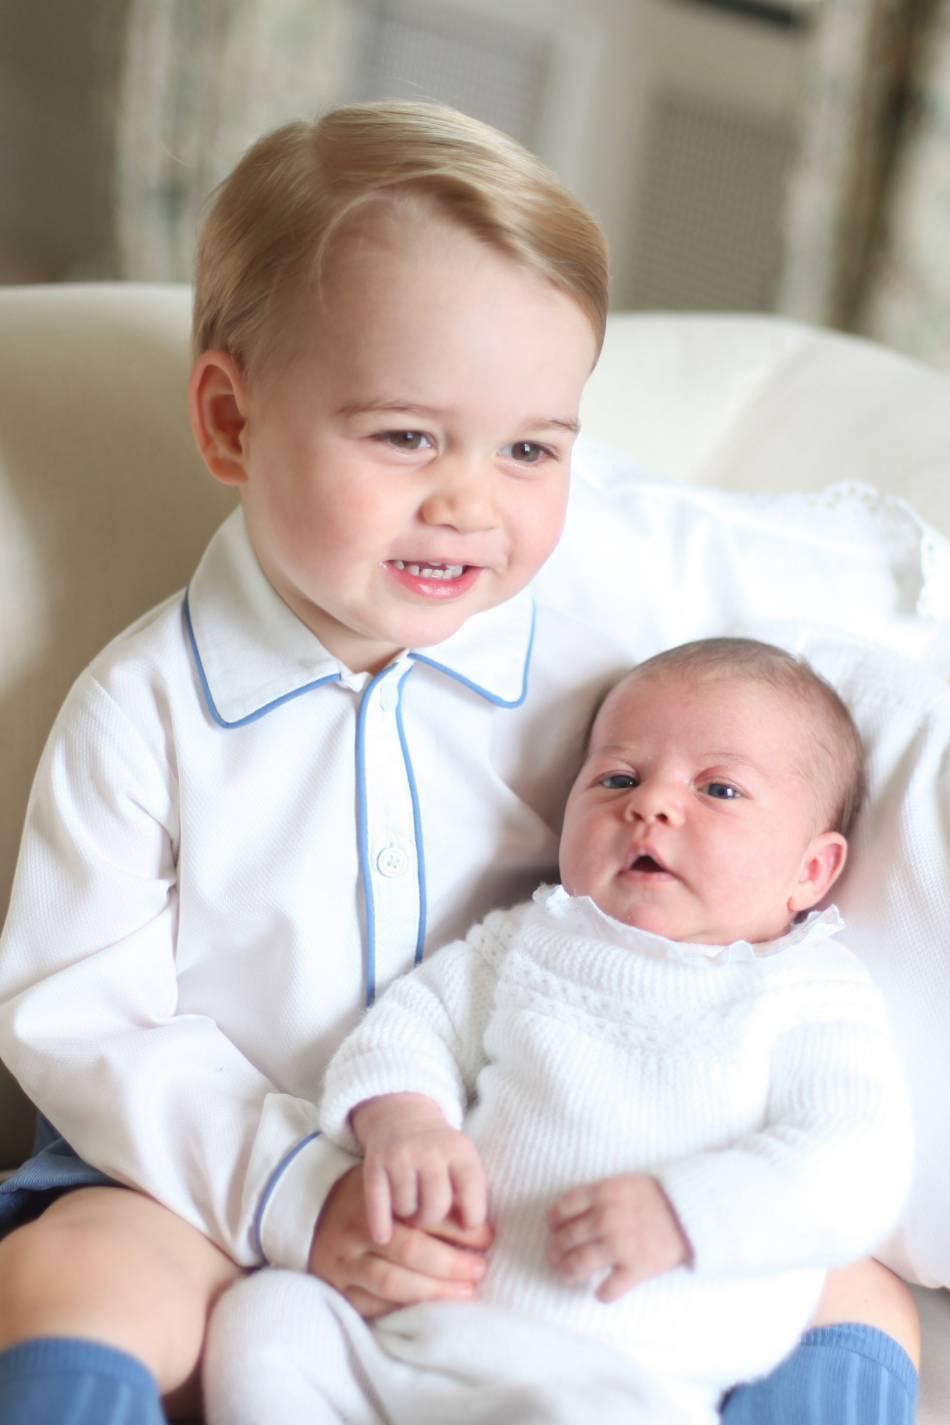 Le prince George et sa soeur, la princesse Charlotte.